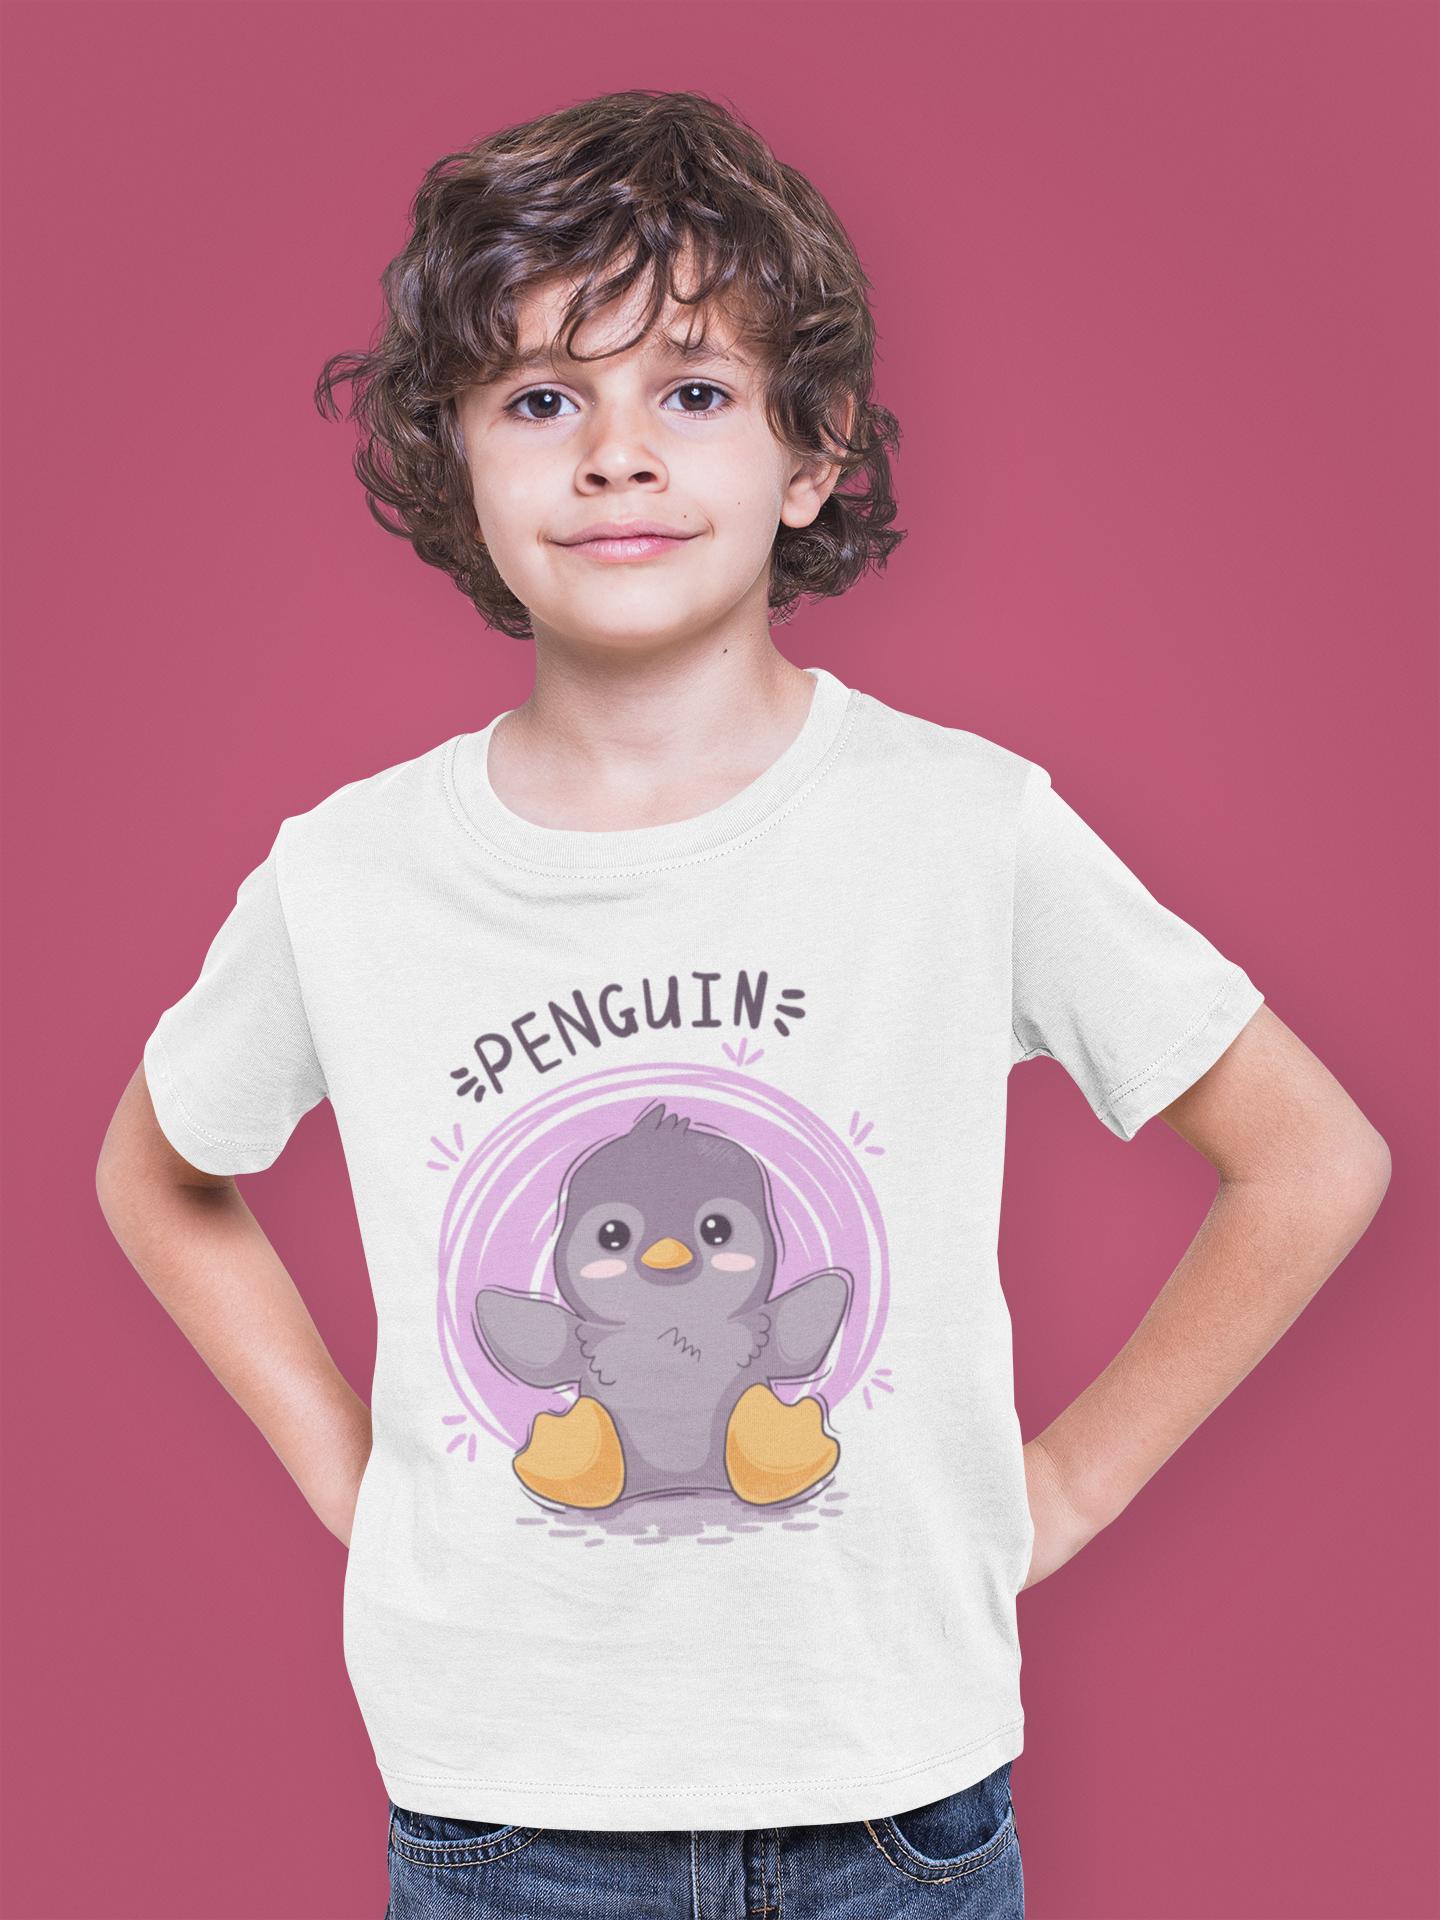 تي شيرت للأطفال برينت لاين T Shirts For Women Mens Tops T Shirt